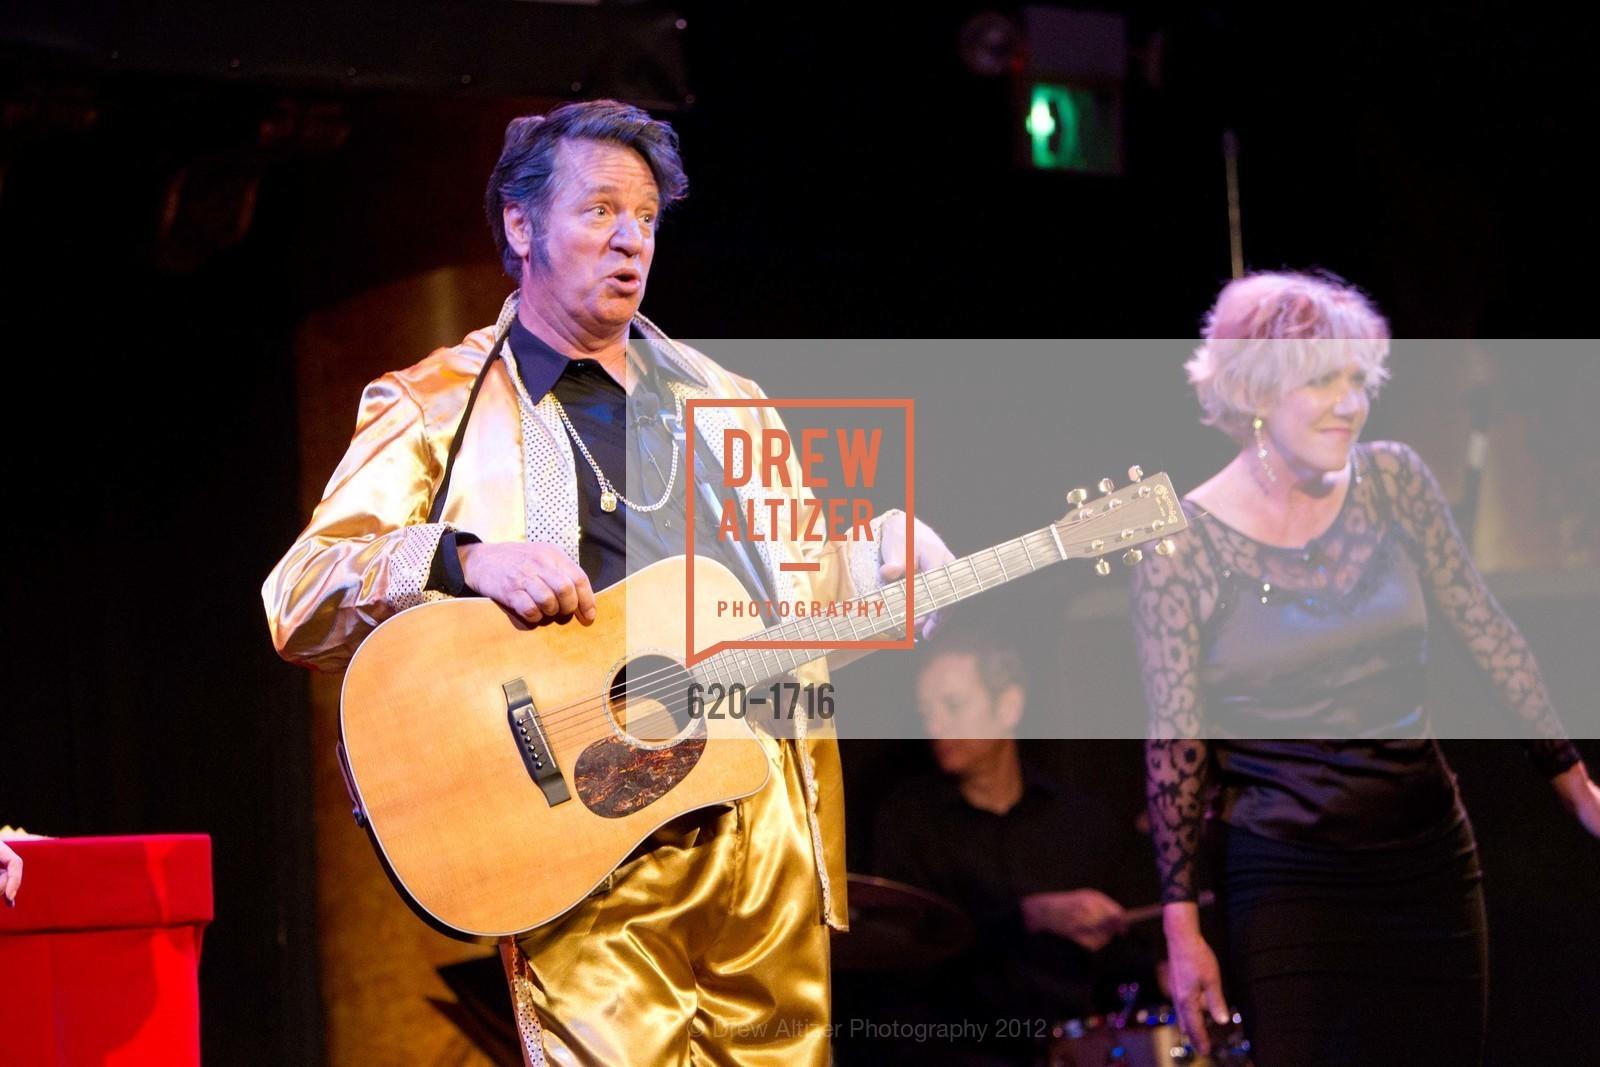 Performance, Photo #620-1716